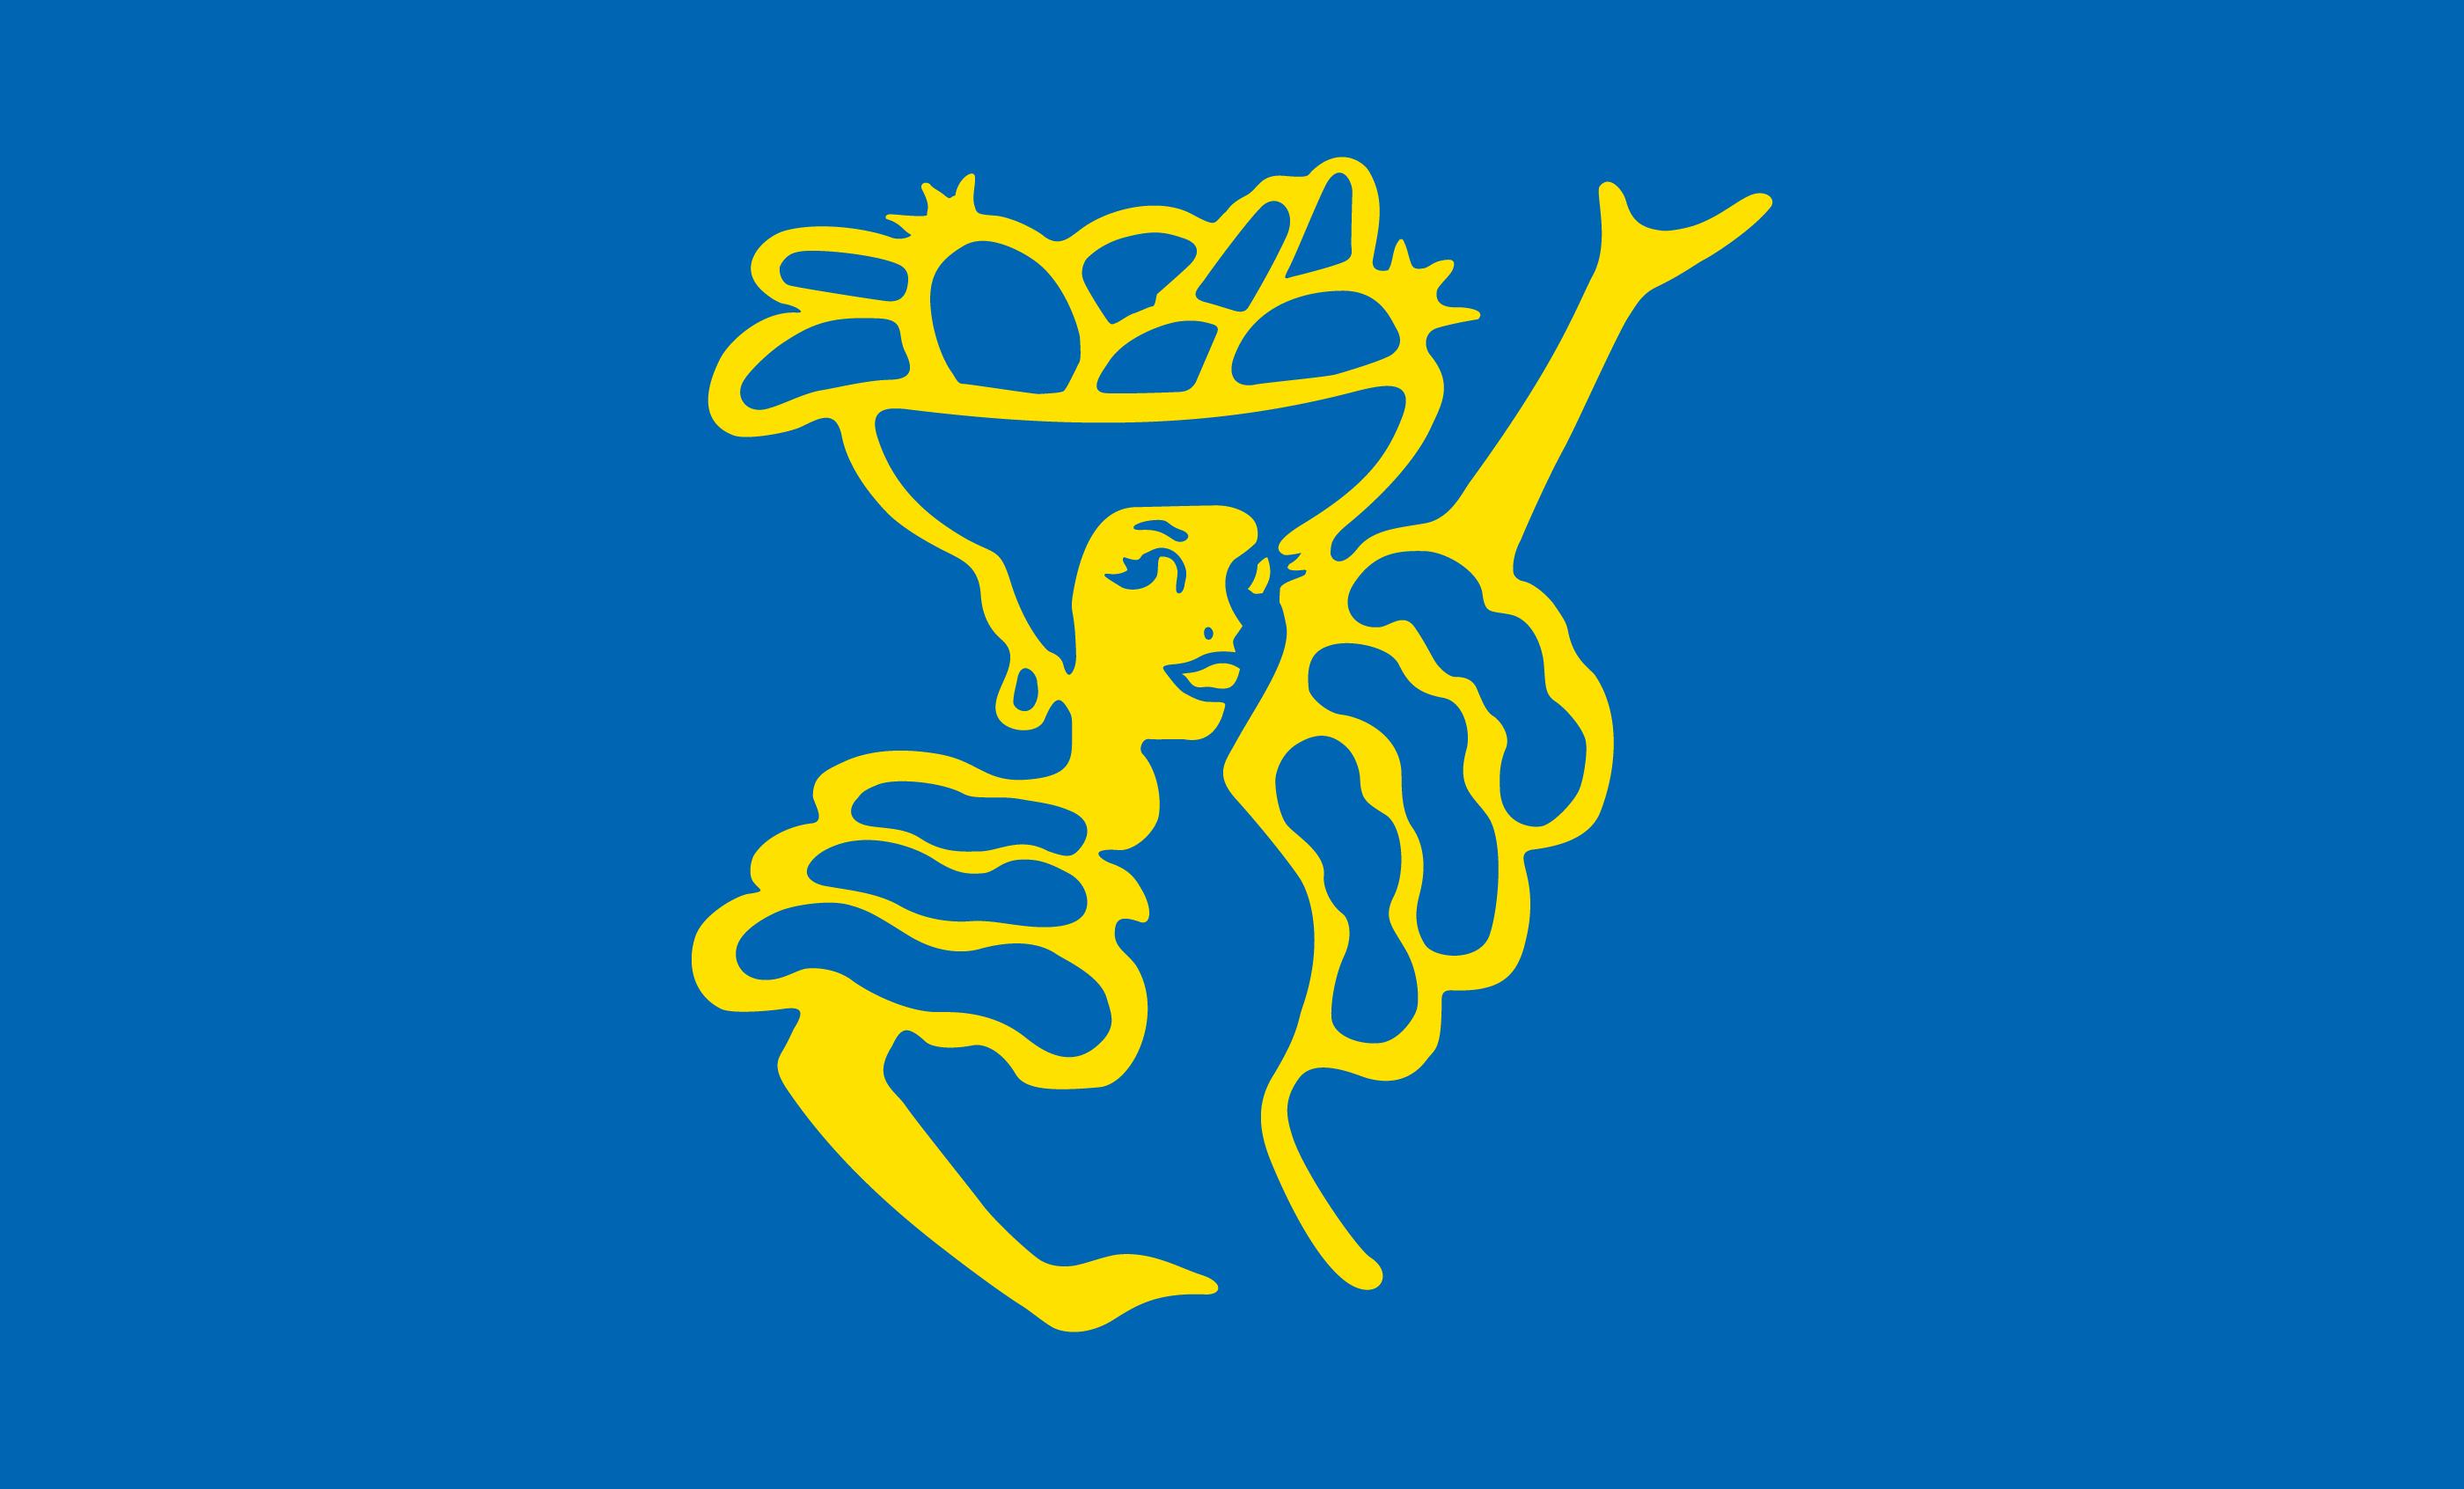 Illustration of Miss Chiquita